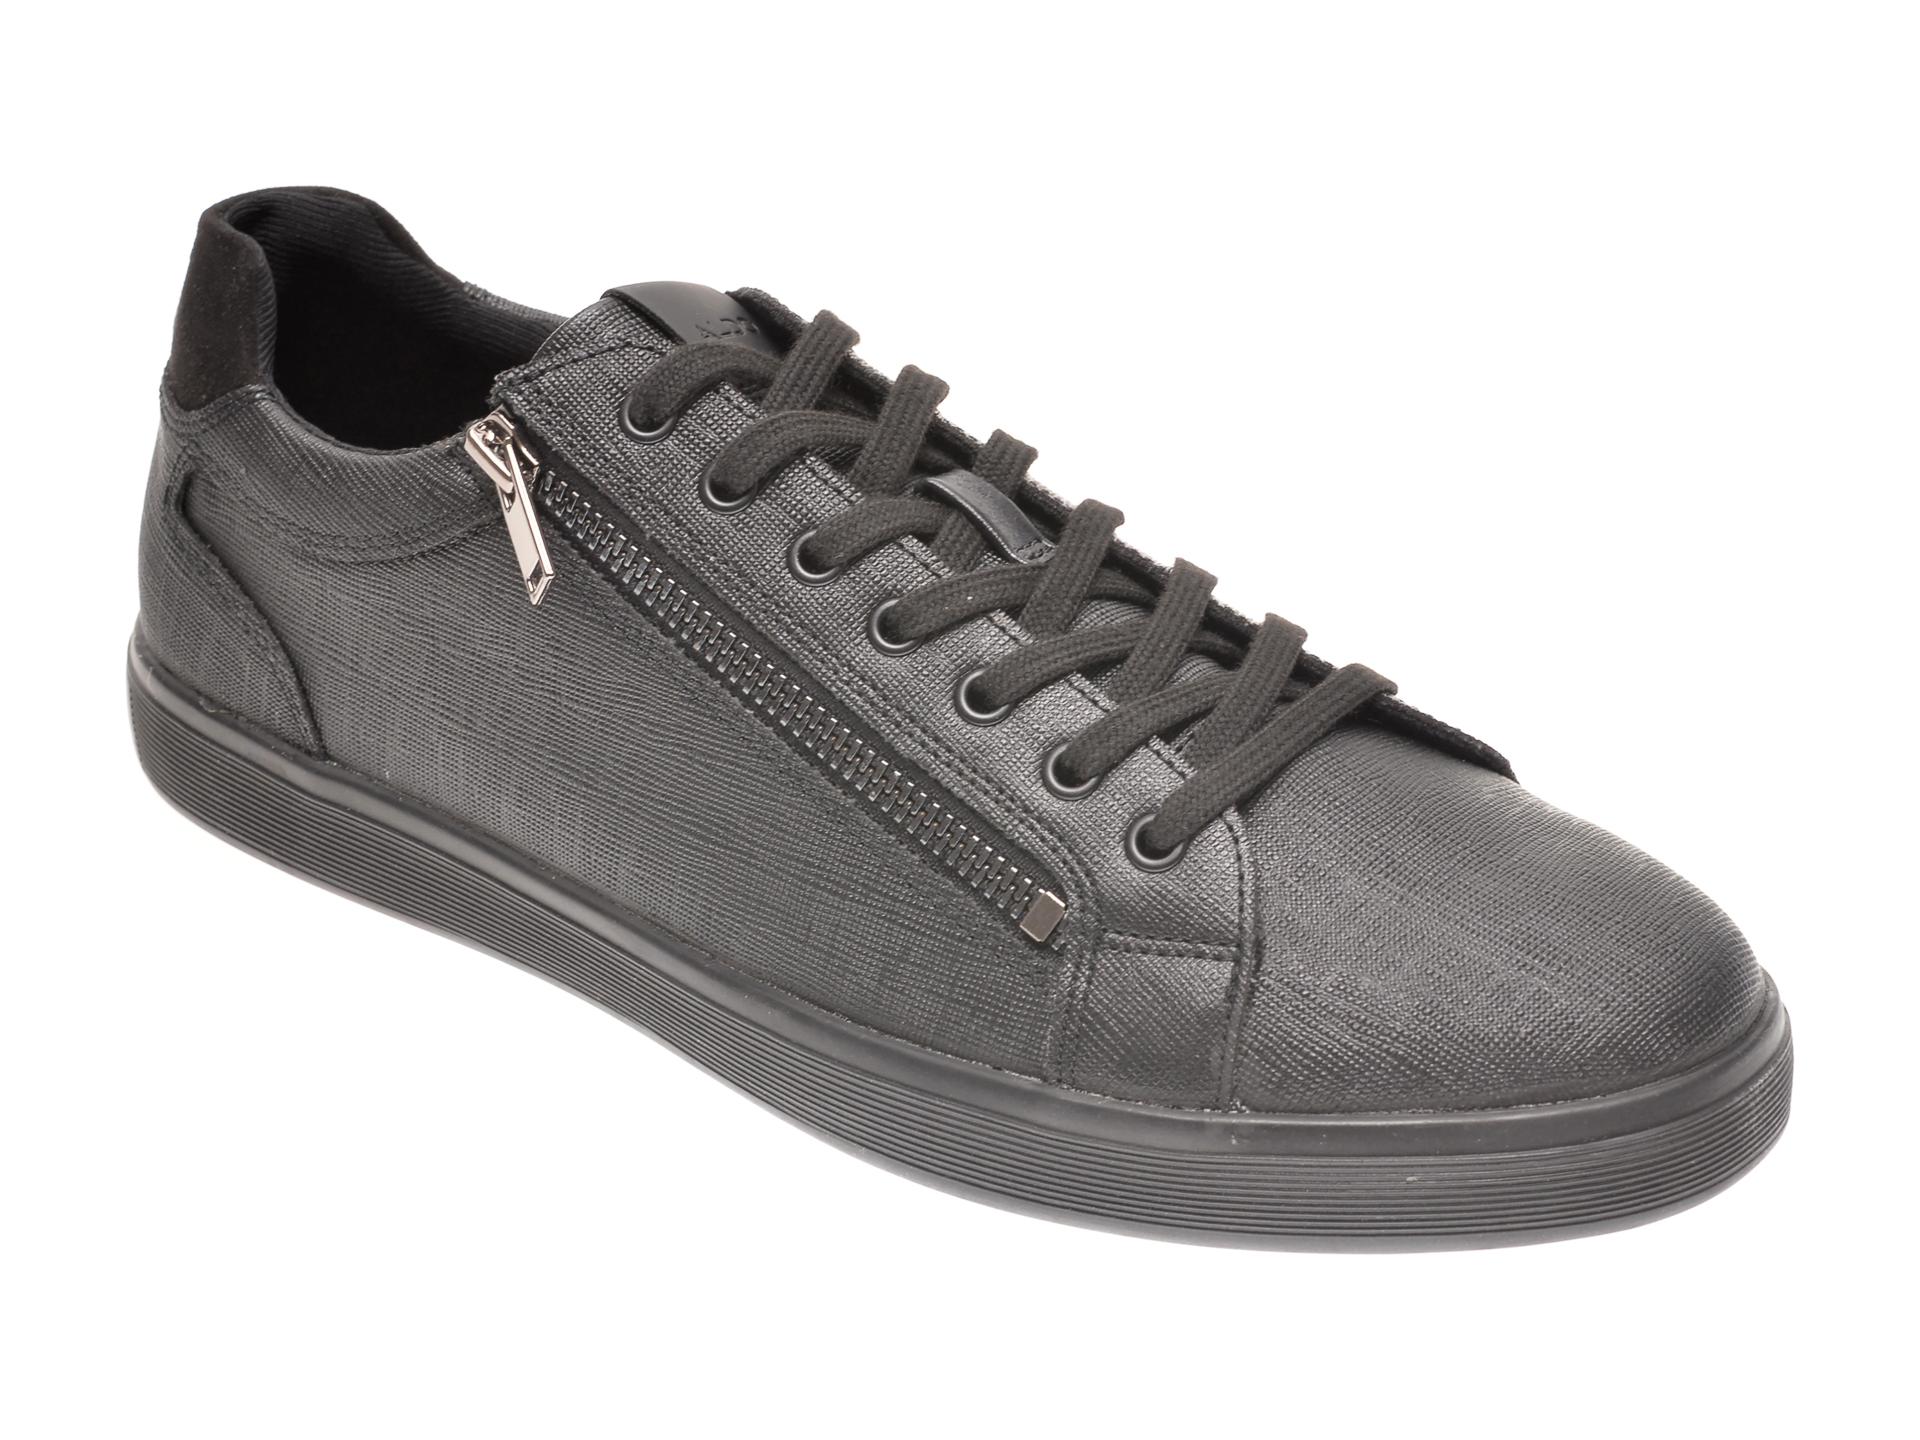 Pantofi ALDO negri, Zaywia001, din piele ecologica imagine